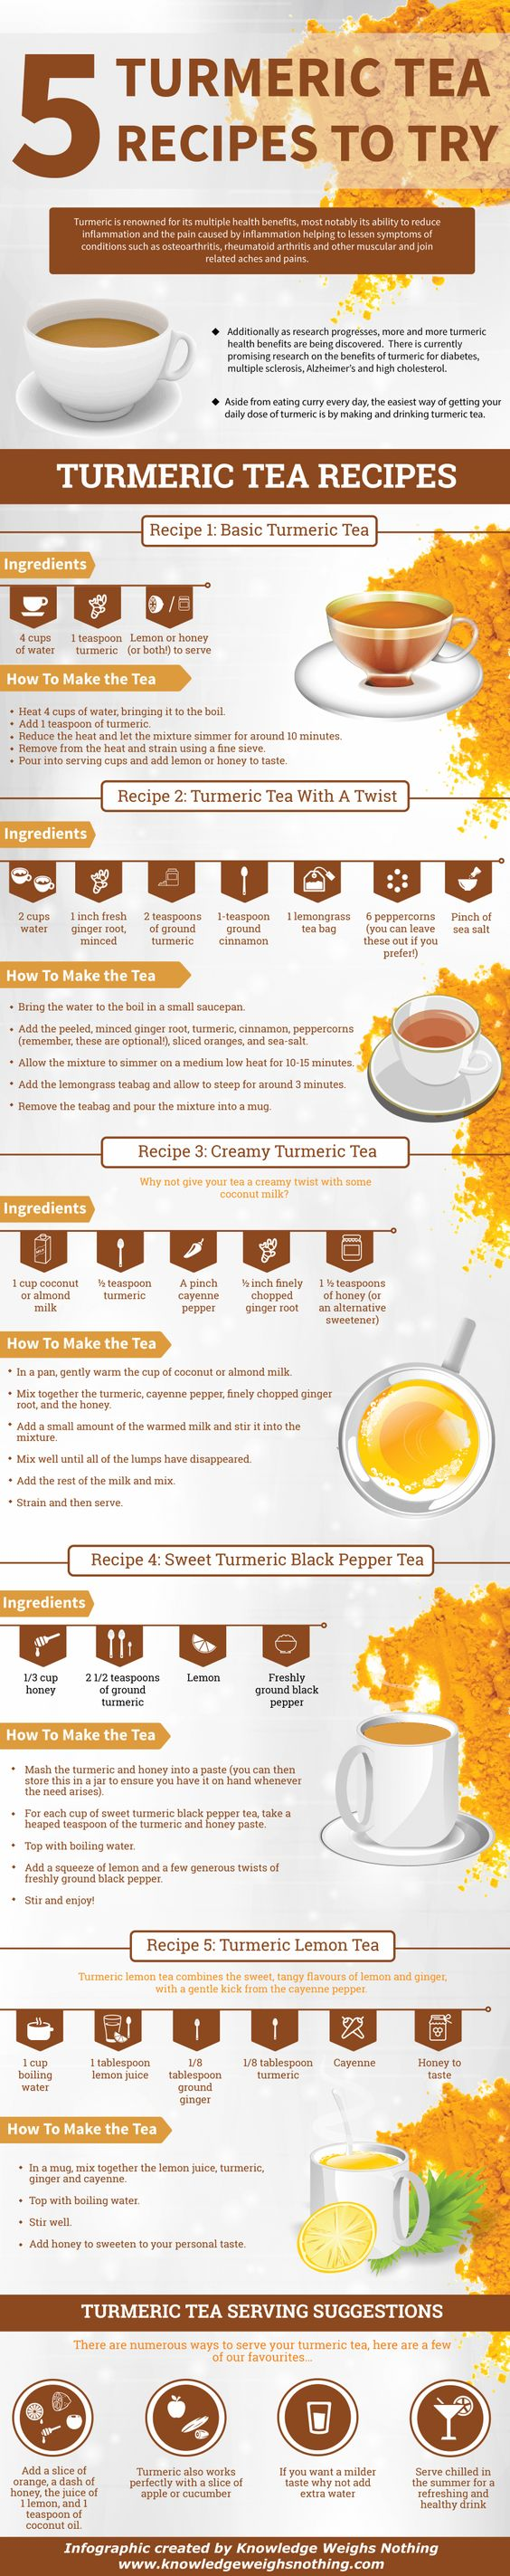 Turmeric Tea Infographic Web